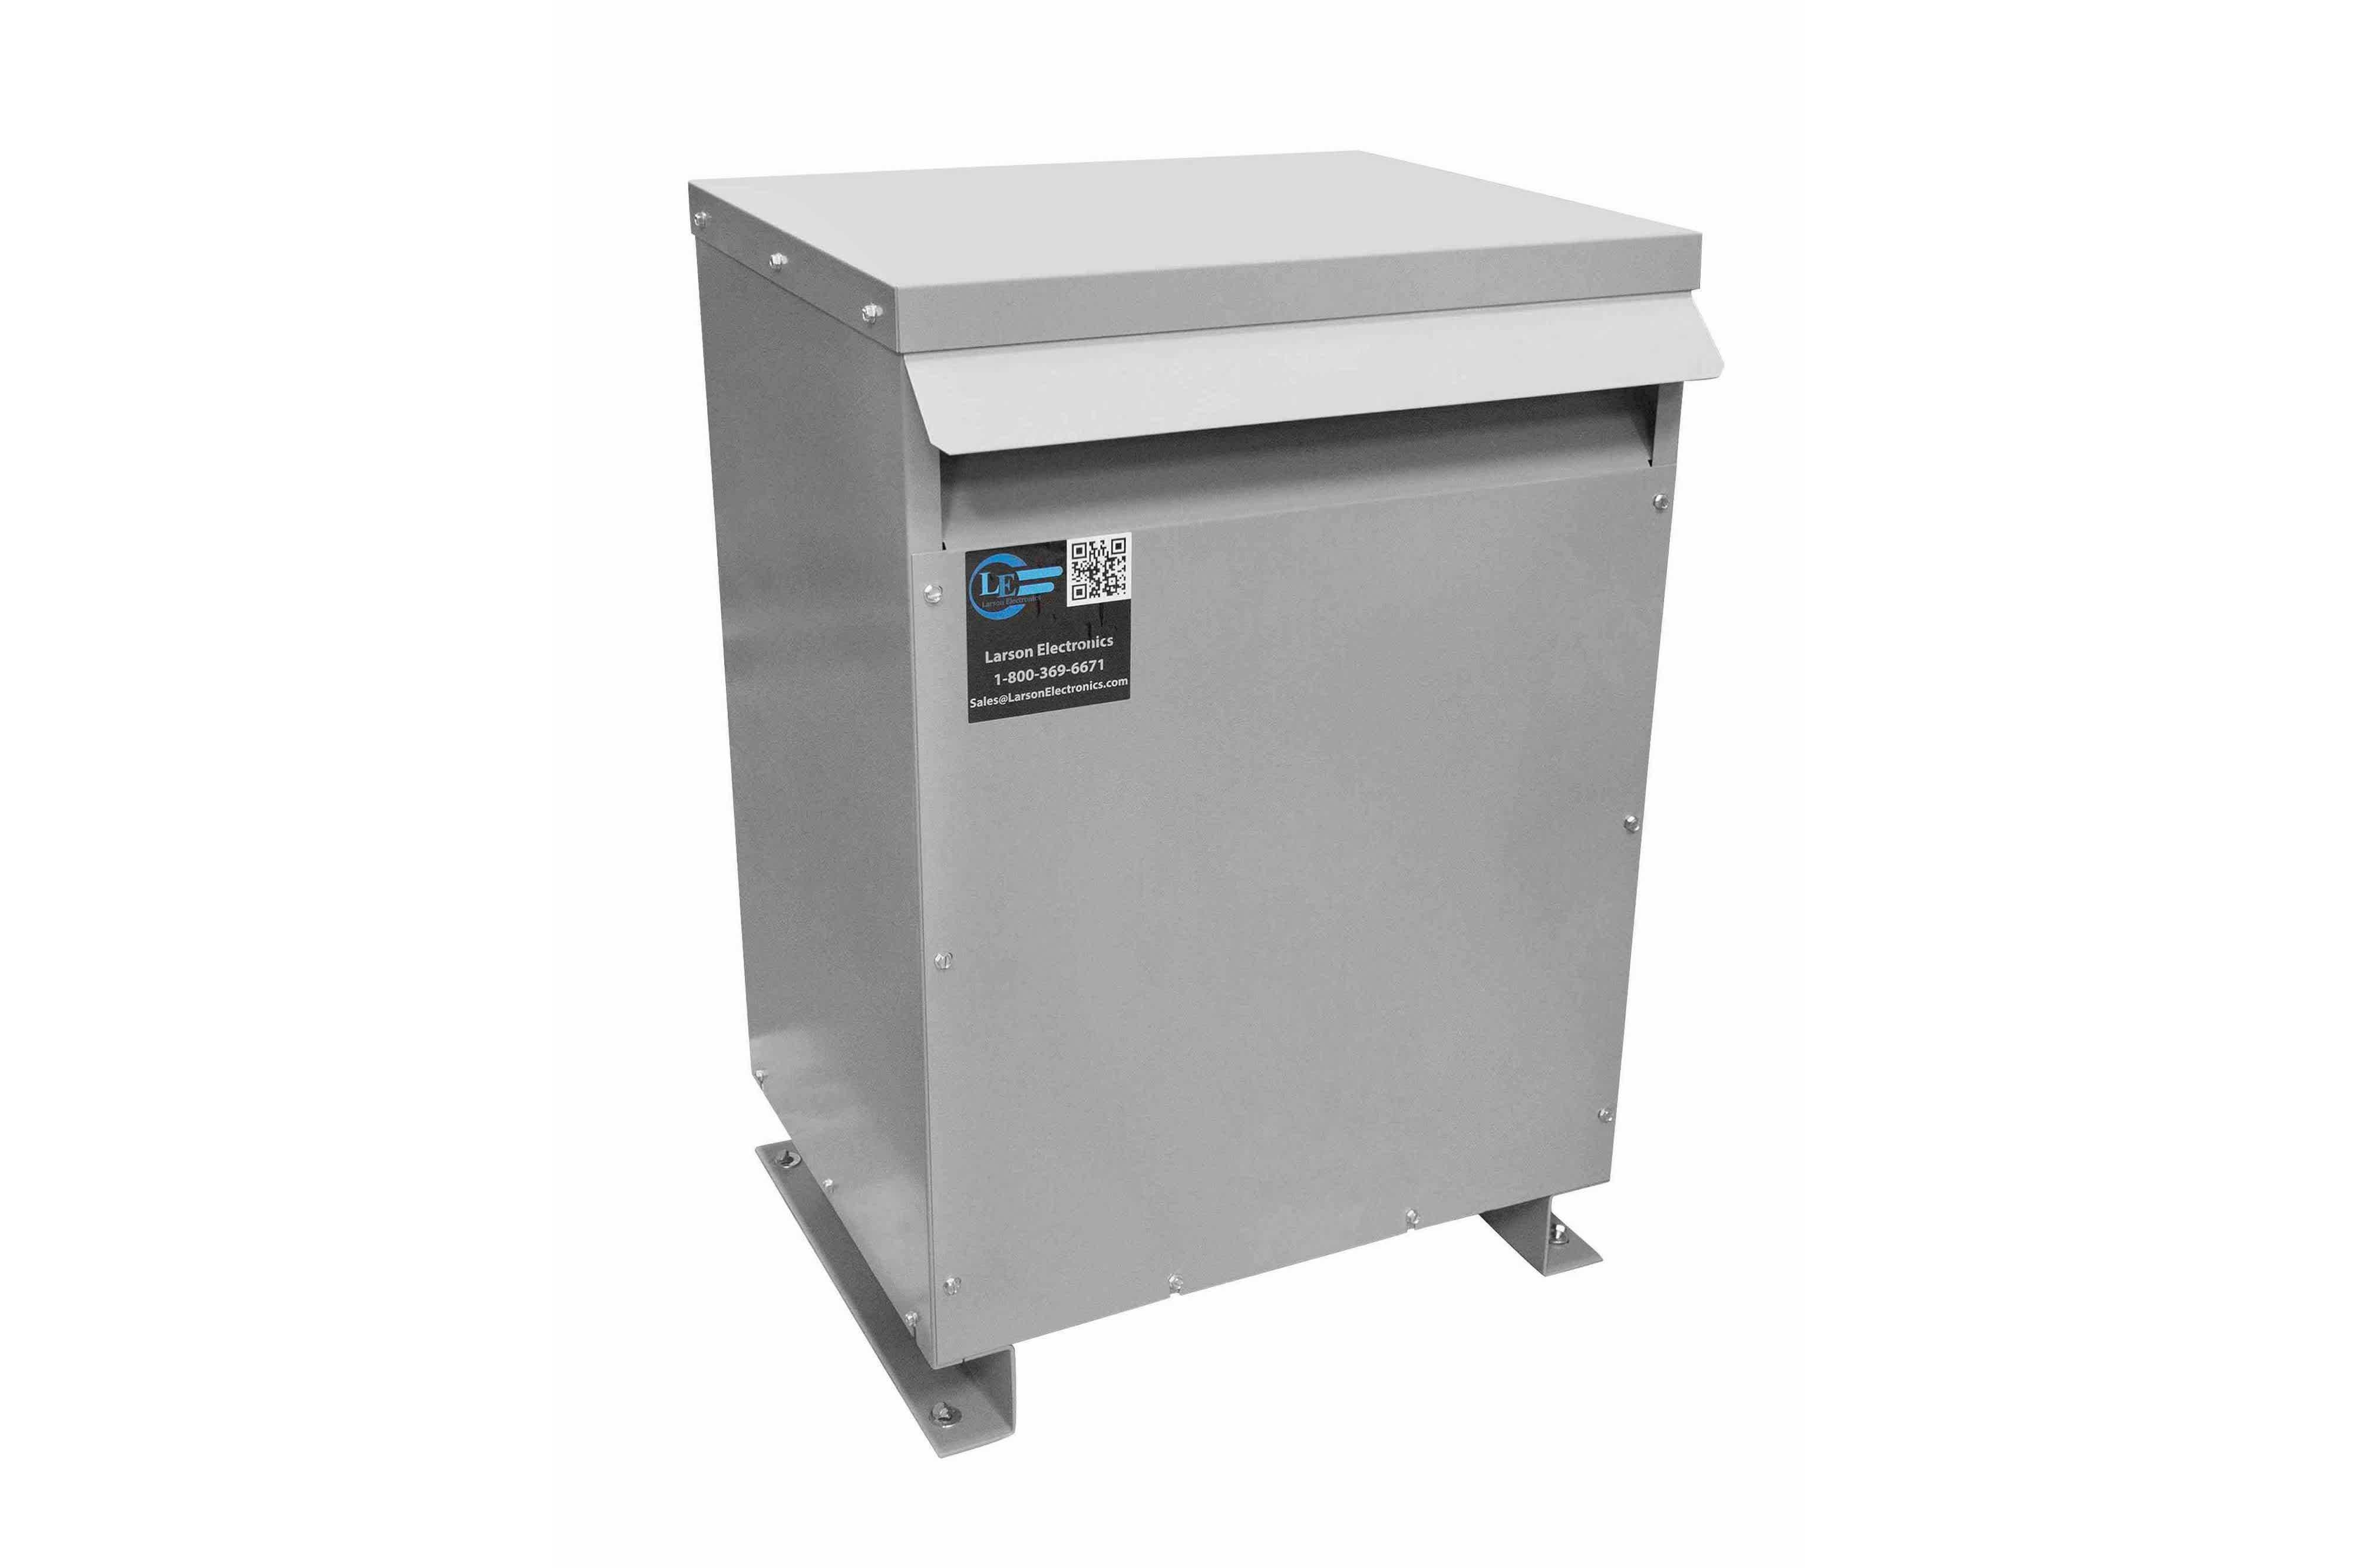 29 kVA 3PH Isolation Transformer, 600V Wye Primary, 480V Delta Secondary, N3R, Ventilated, 60 Hz